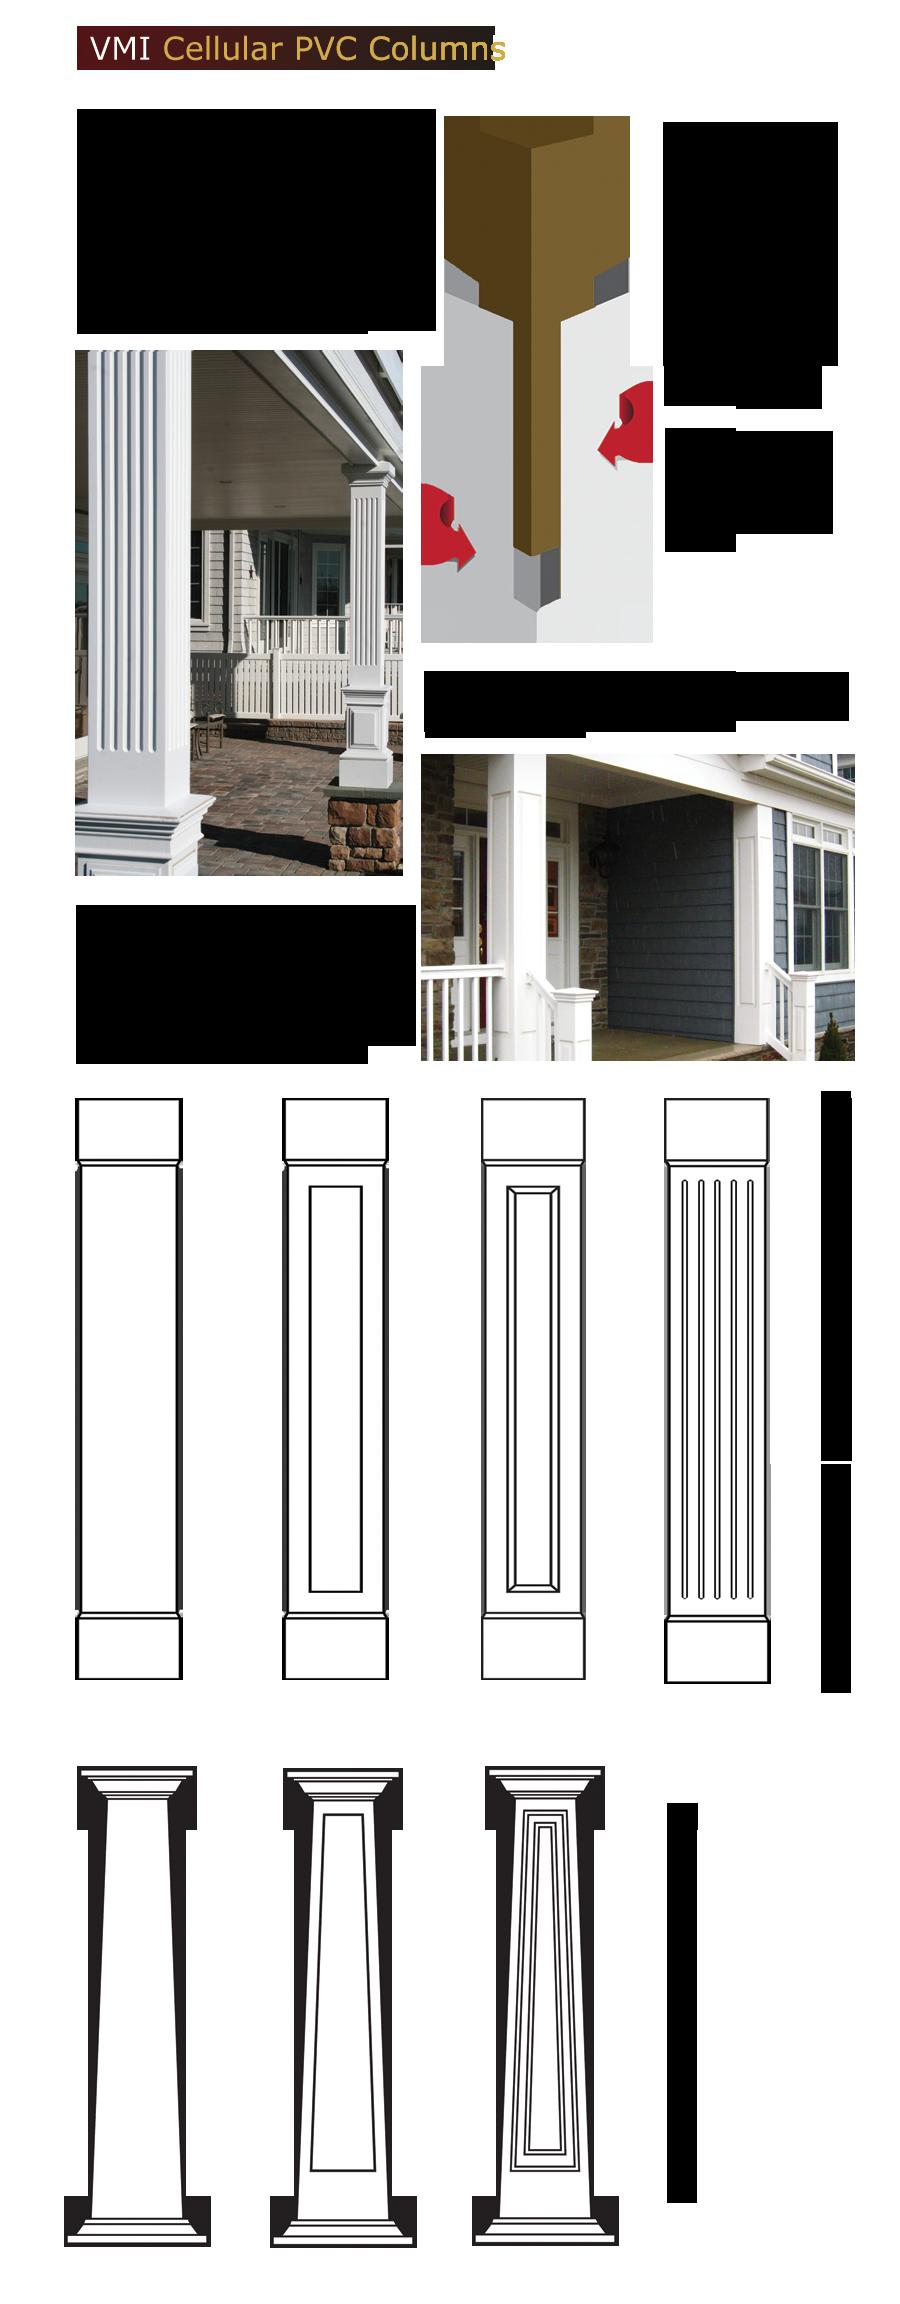 Cellular PVC Columns